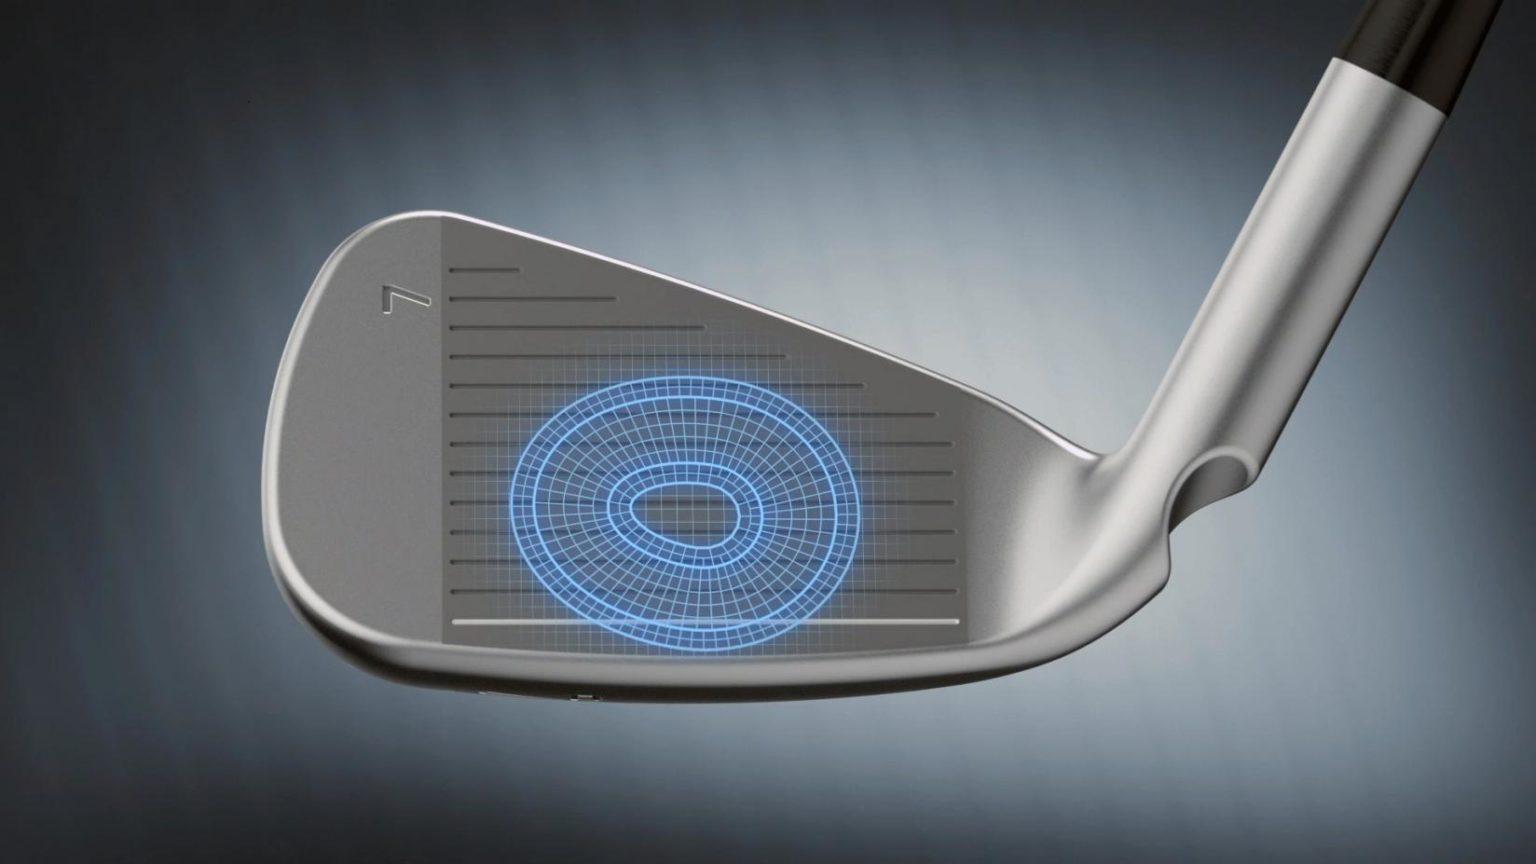 ping-intel-golf-1.jpg.rendition.intel.web.1648.927